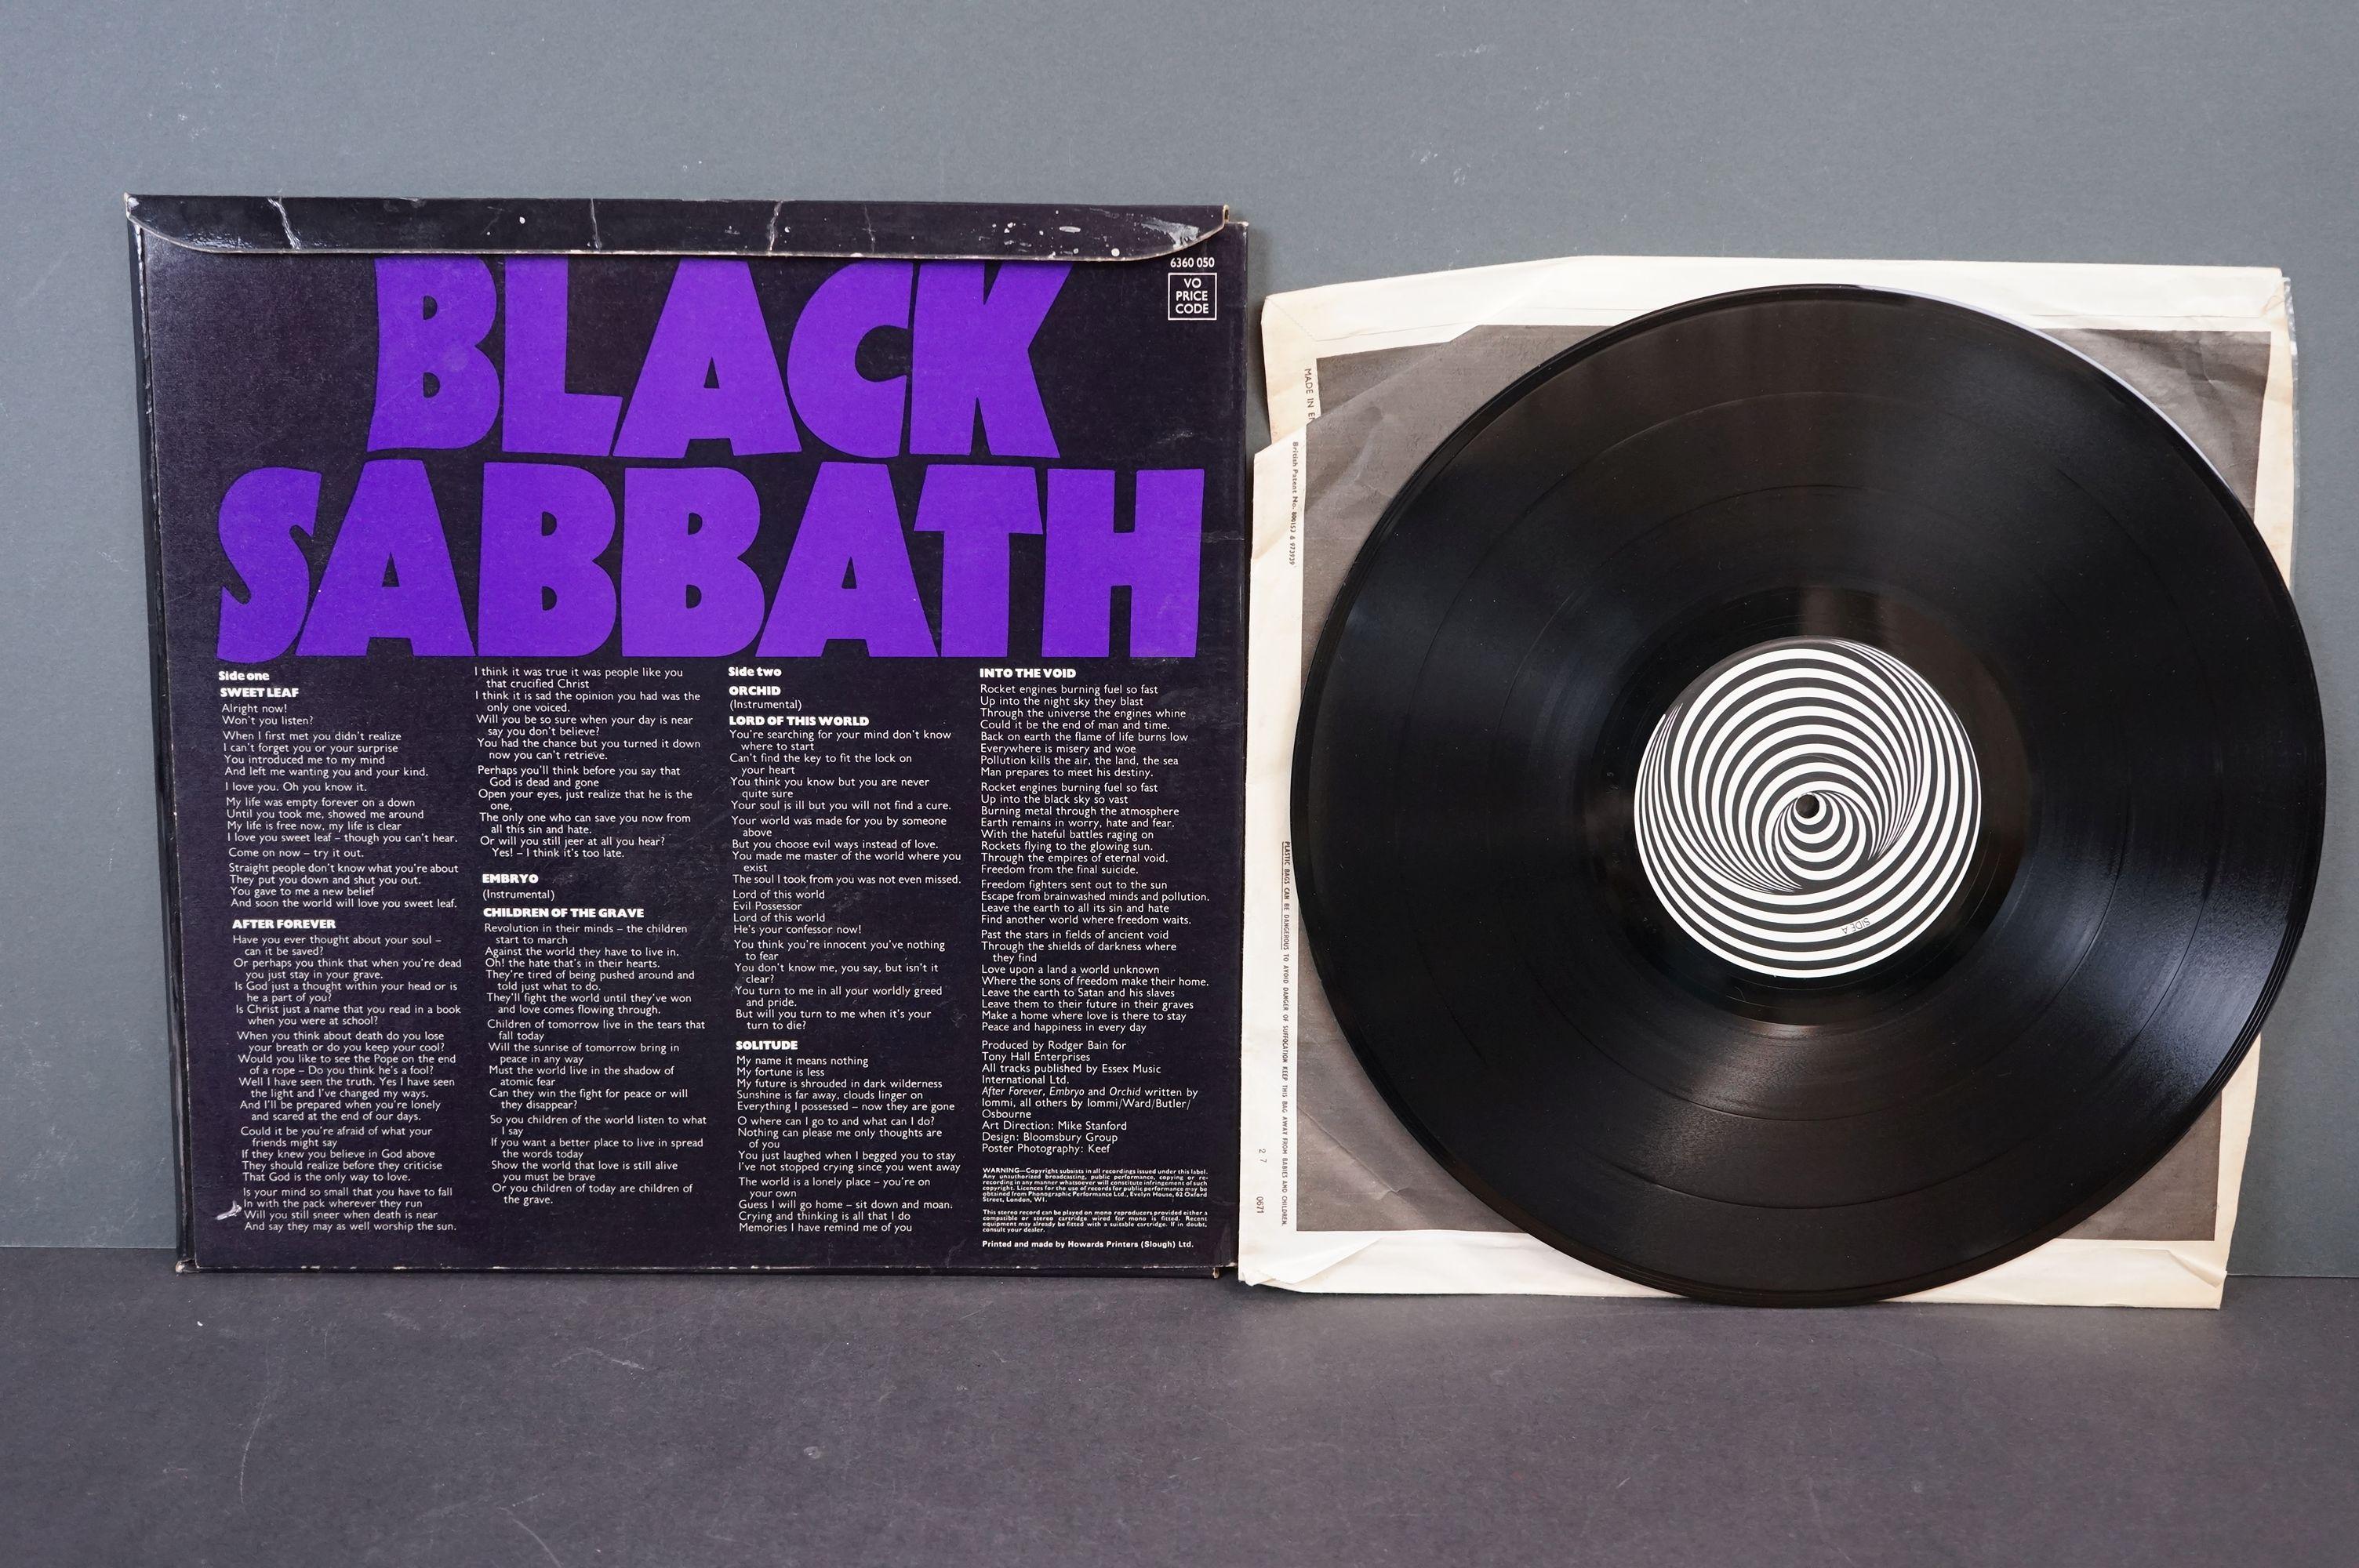 Vinyl - Black Sabbath - Master Of Reality. Original UK 1971 1st Black label, Swirl Vertigo label - Image 4 of 5